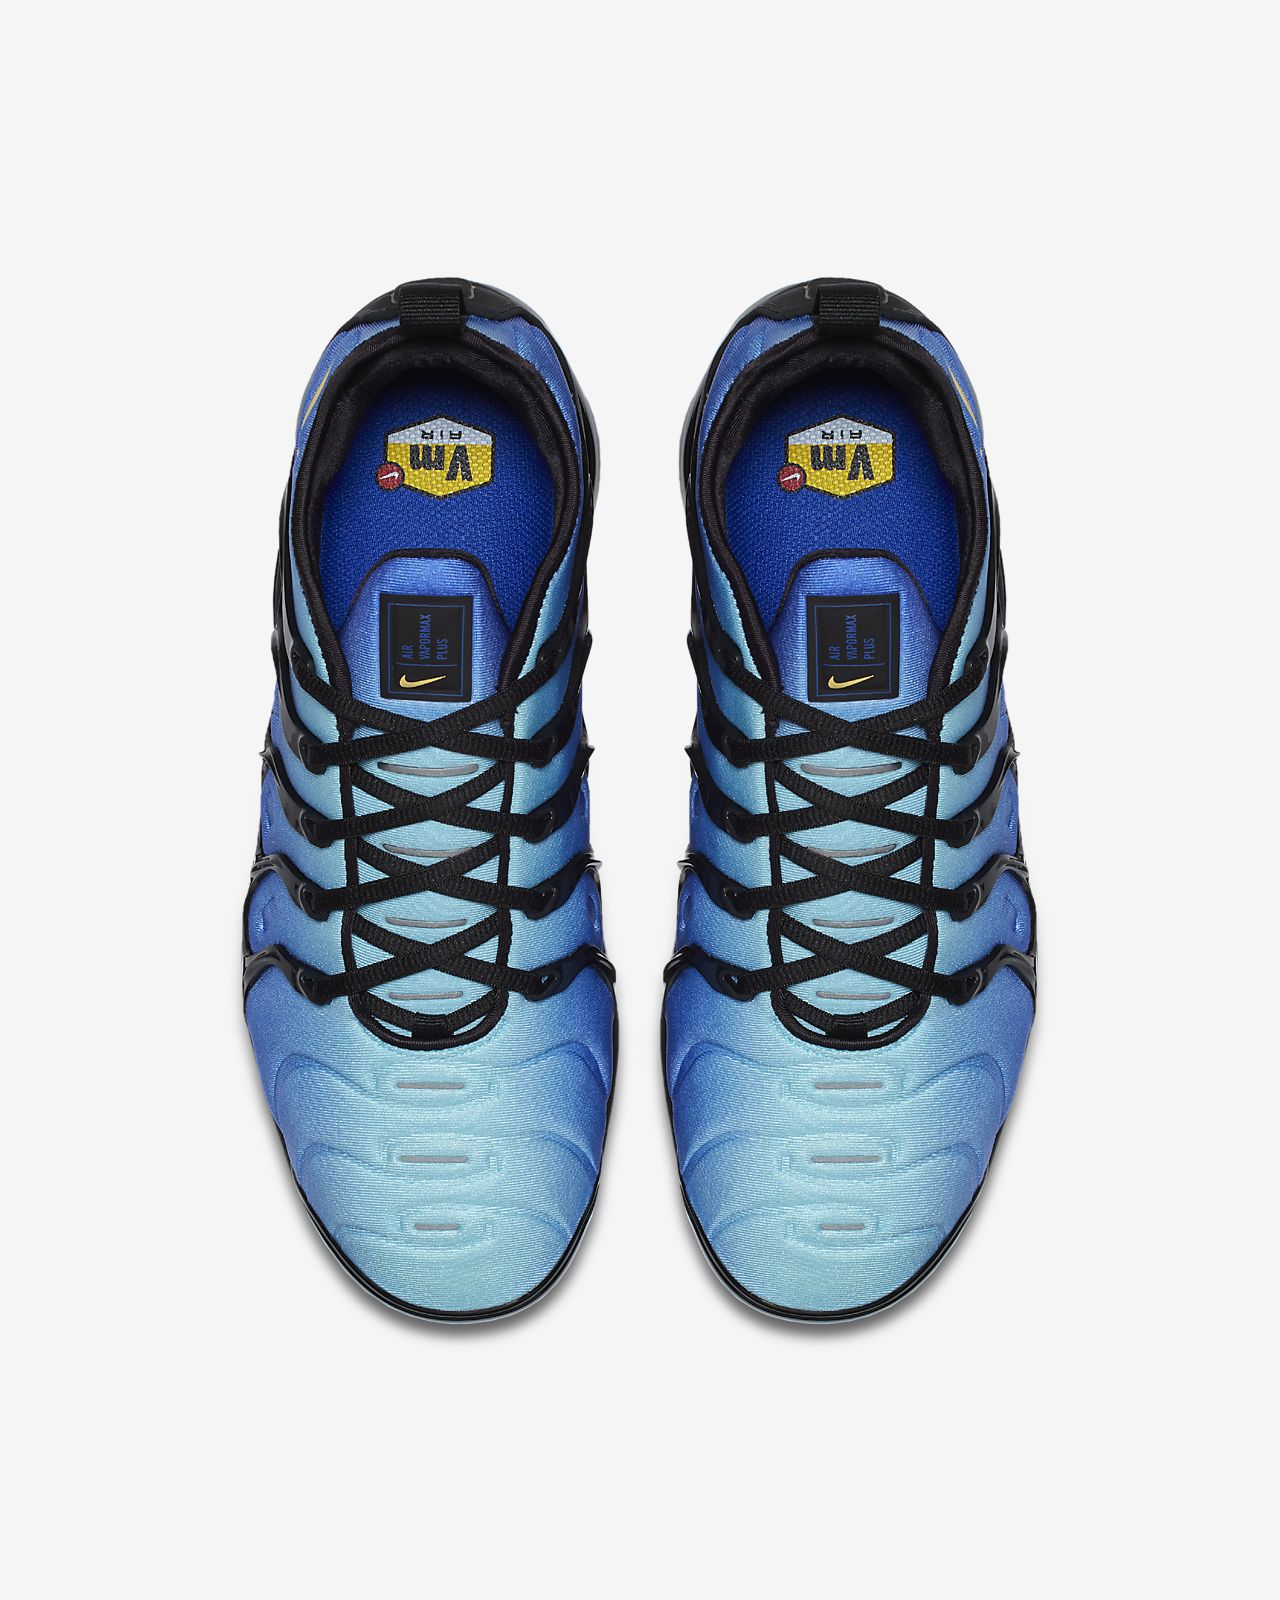 new styles c7ab5 94f14 Factory Sale Nike Free 6.0 Spiderman Breathable Herren Schuhe Blau Grau  2cxTDkIl,  Price Rotuced Nike Cortez Damen Leather Schuhe Lila Weiß  3A5IhlVQ,Trend ...